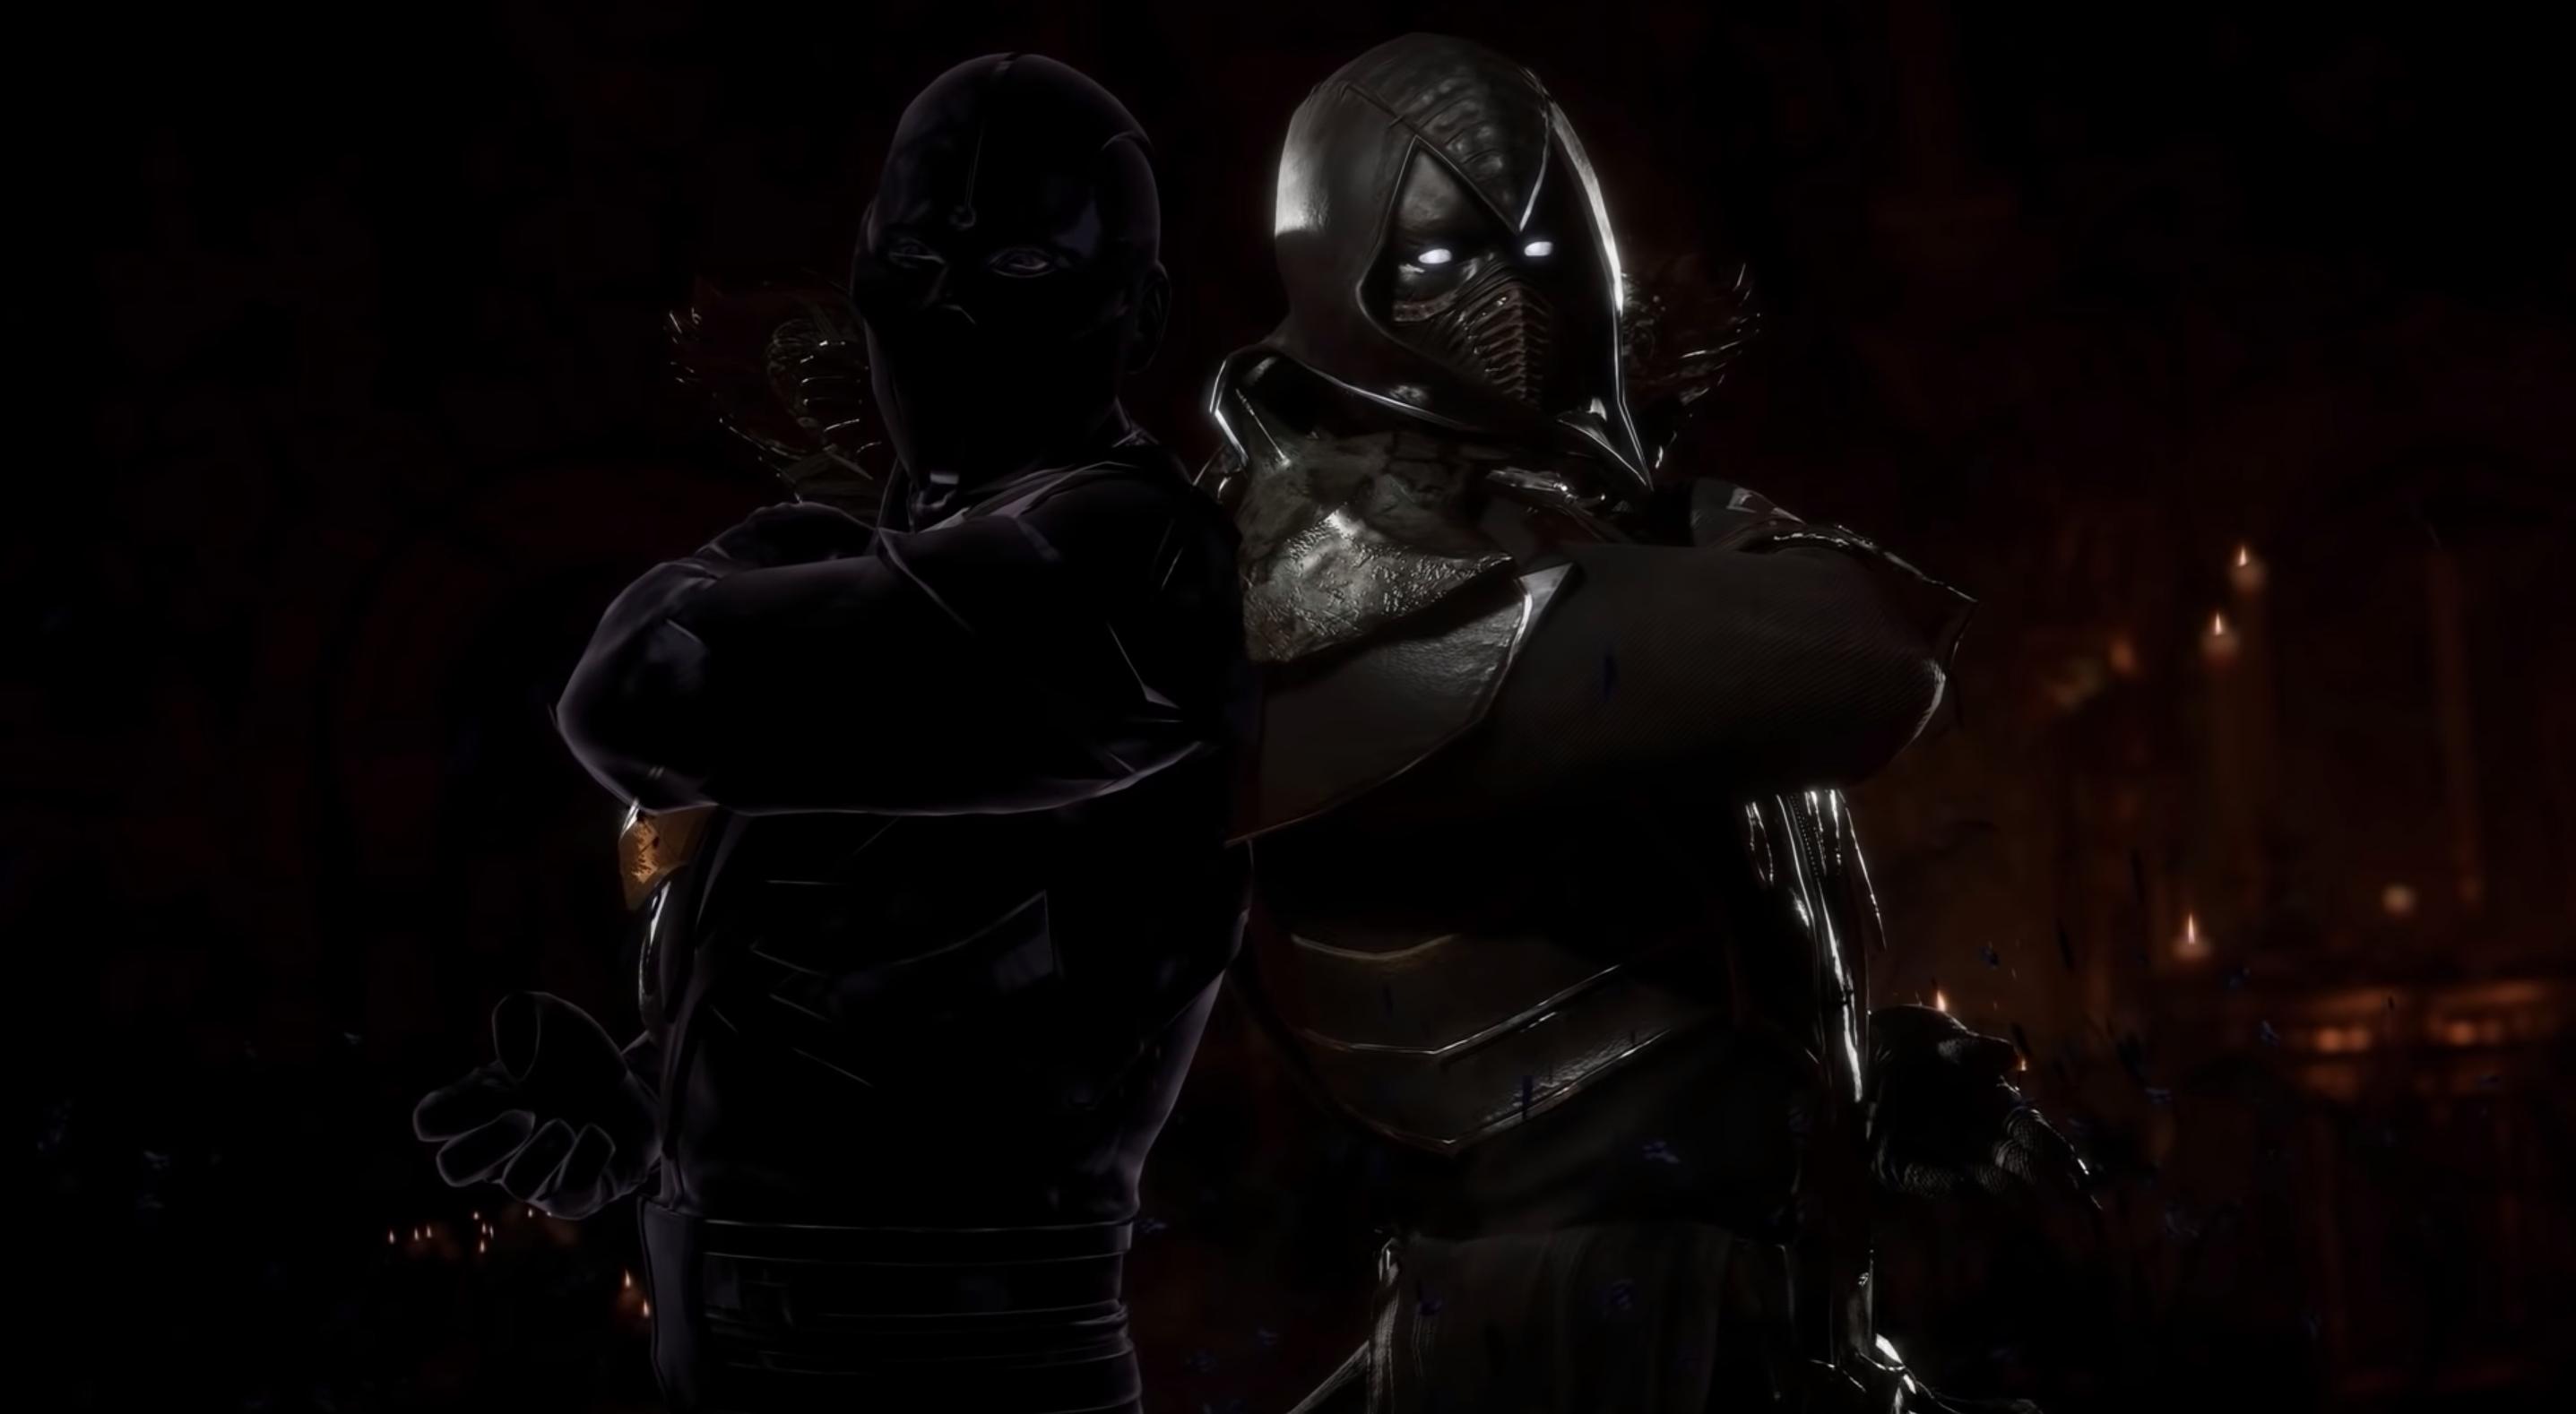 Mortal kombat 11 game 2019 wallpaper hd games 4k - Mortal kombat 11 wallpaper ...